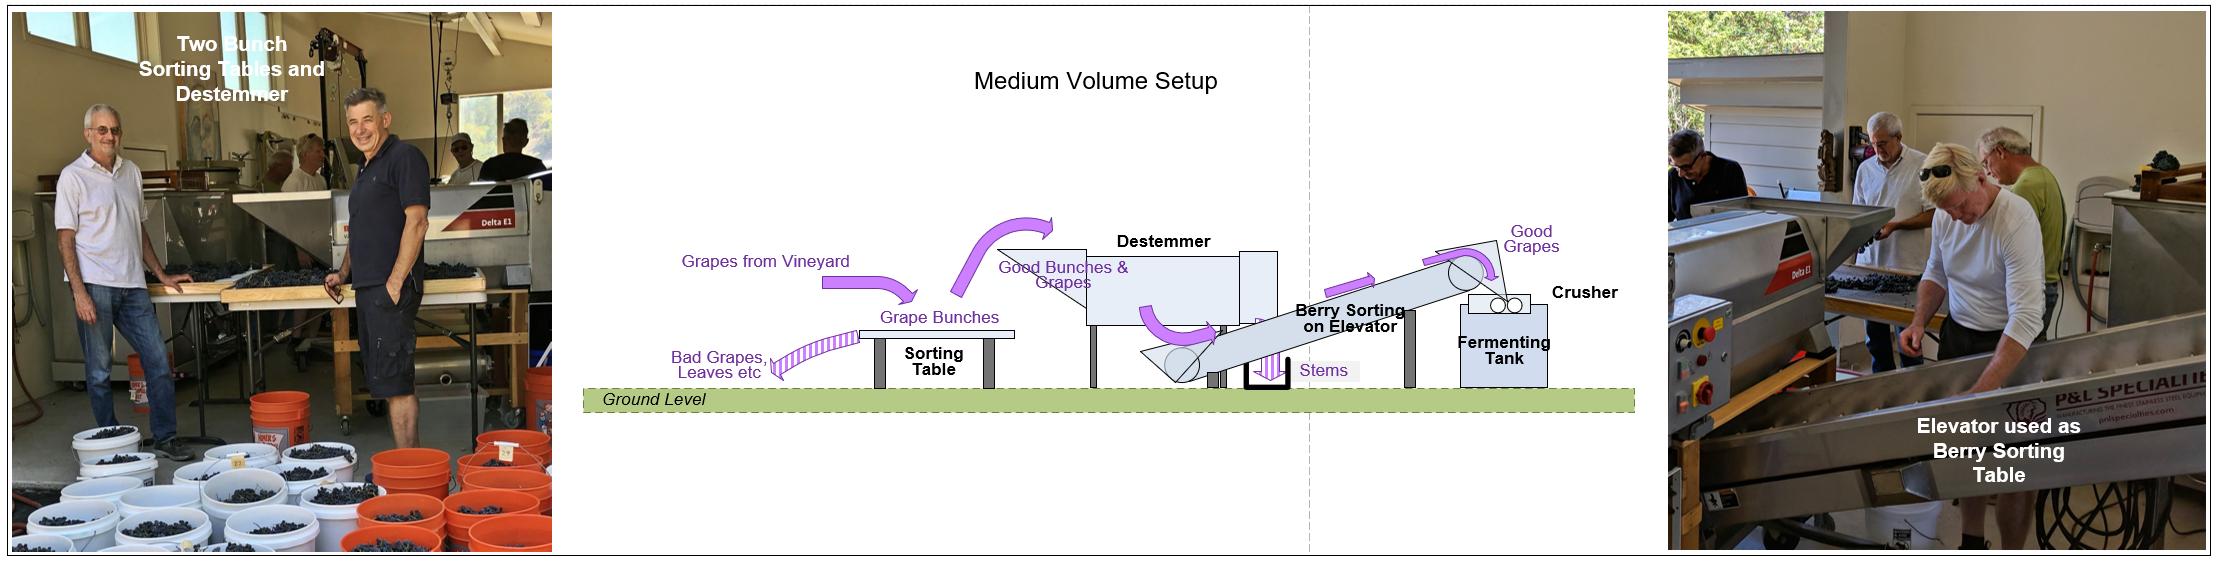 Medium Volume Setup.png